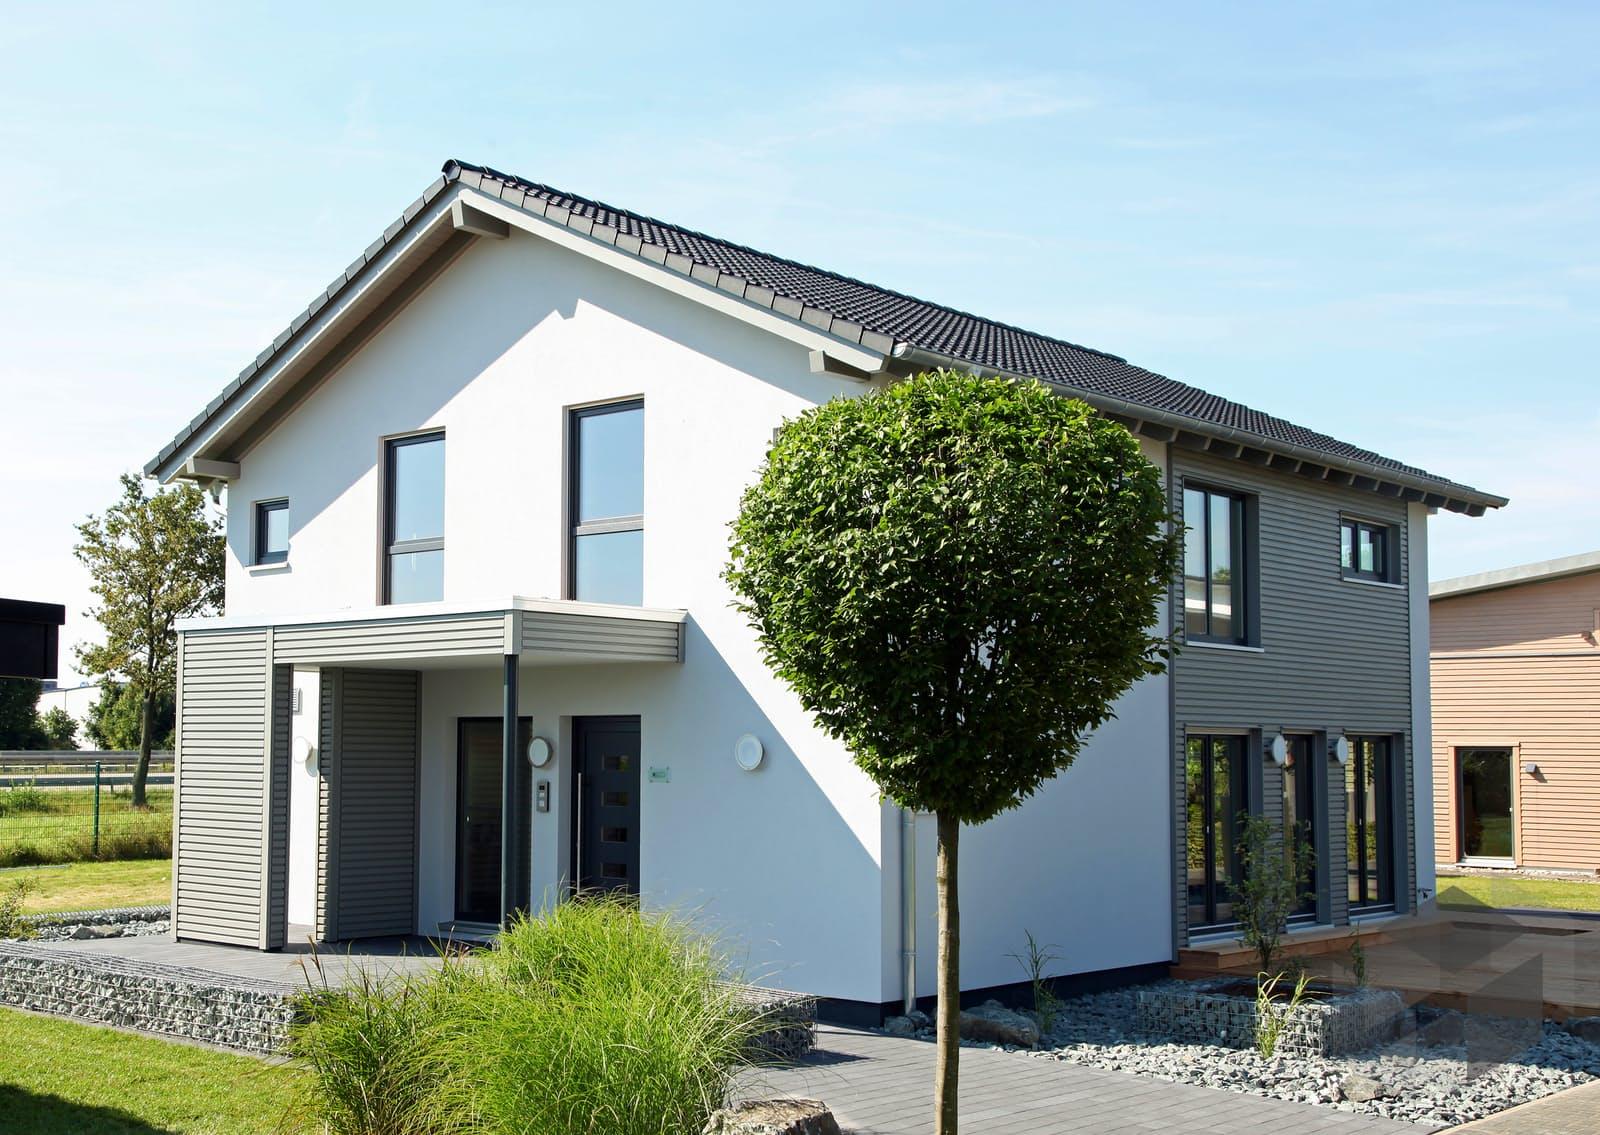 neo 300 musterhaus hannover von fingerhaus komplette daten bersicht. Black Bedroom Furniture Sets. Home Design Ideas